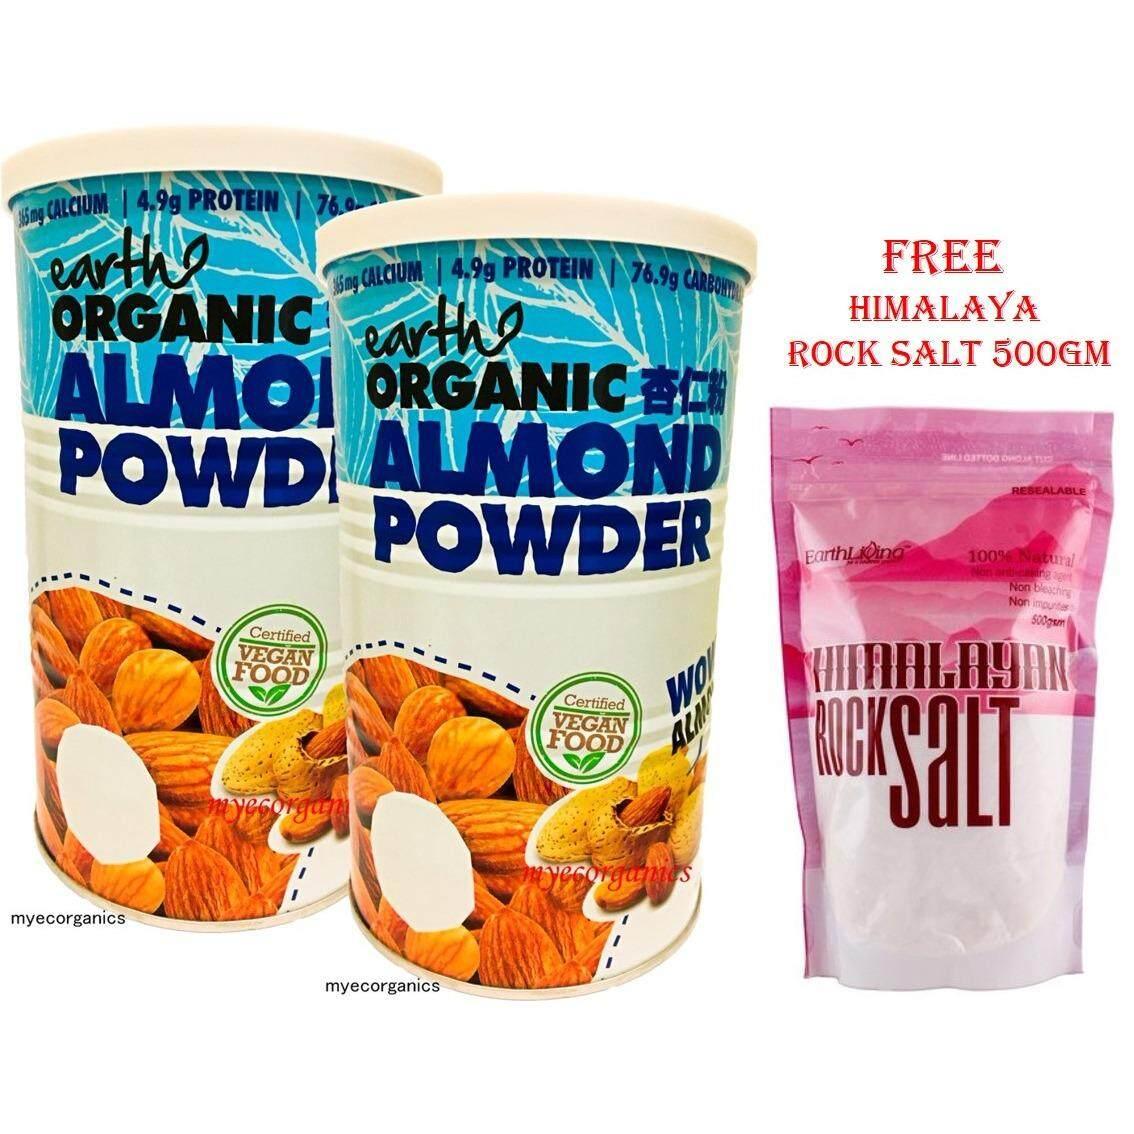 [FREE Rock Salt 500gm] Earth Organic Superfood - Almond Powder (500gm)  EXPIRY: 08/2019